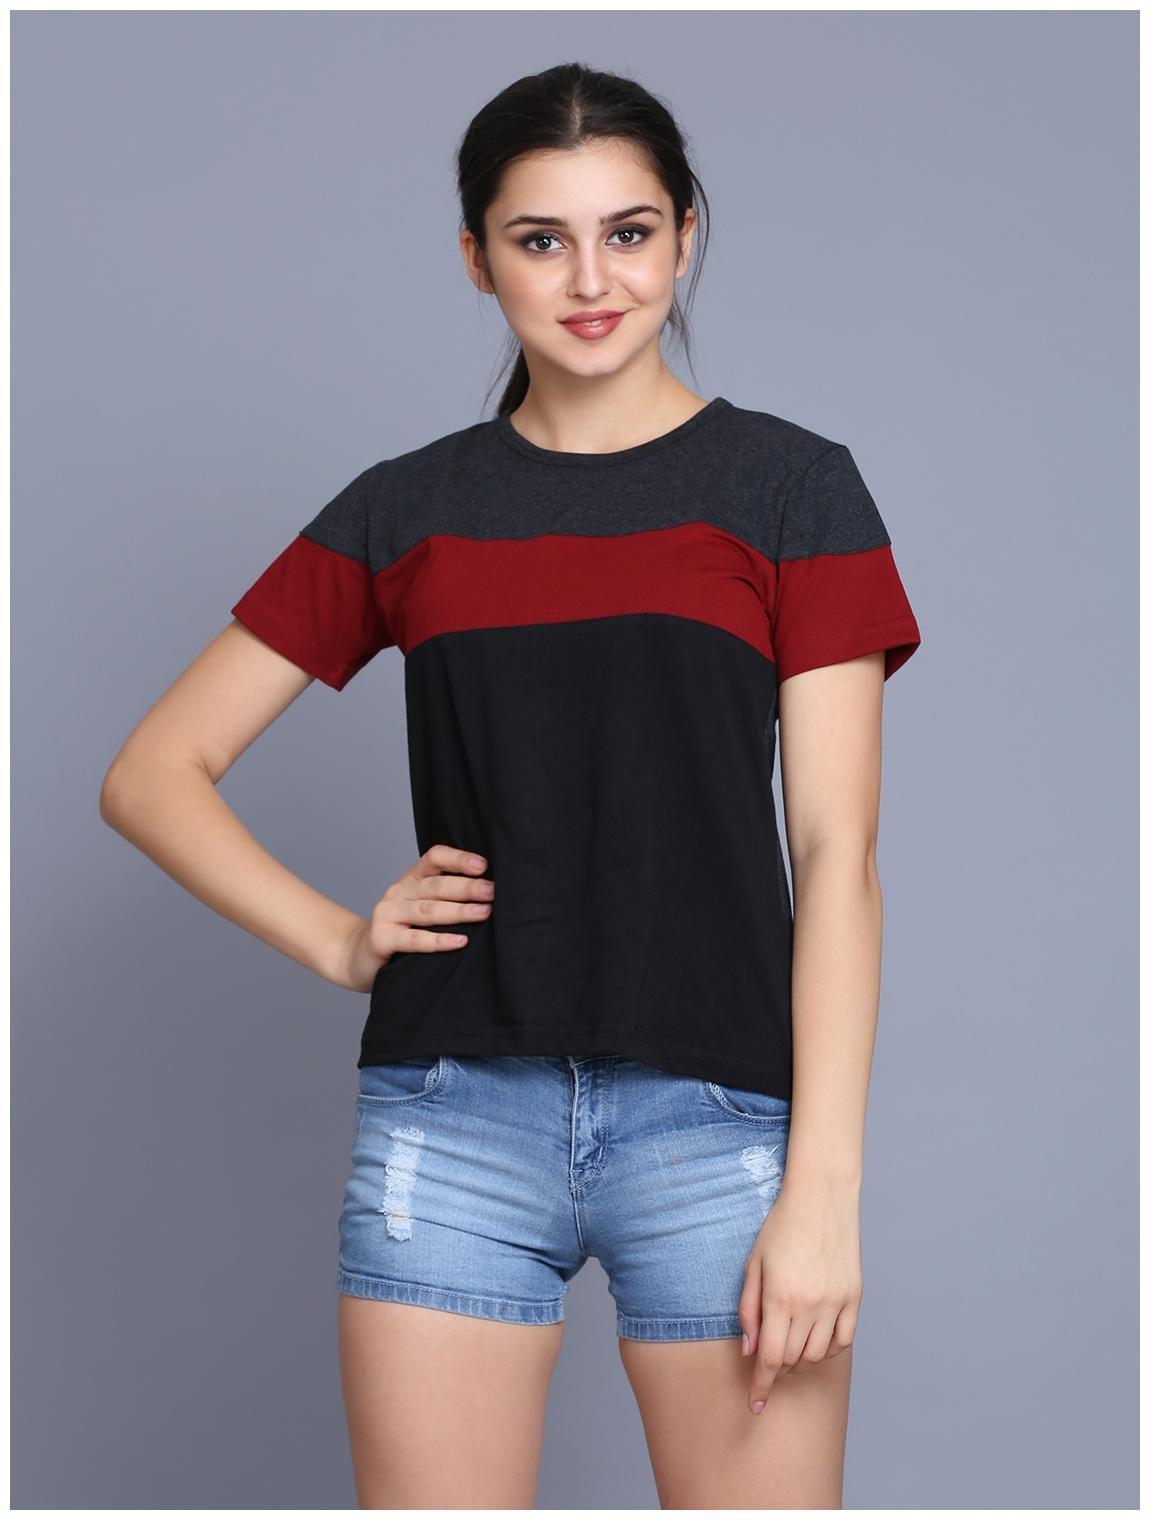 fabstone collection Women Black Regular fit Round neck Cotton T shirt